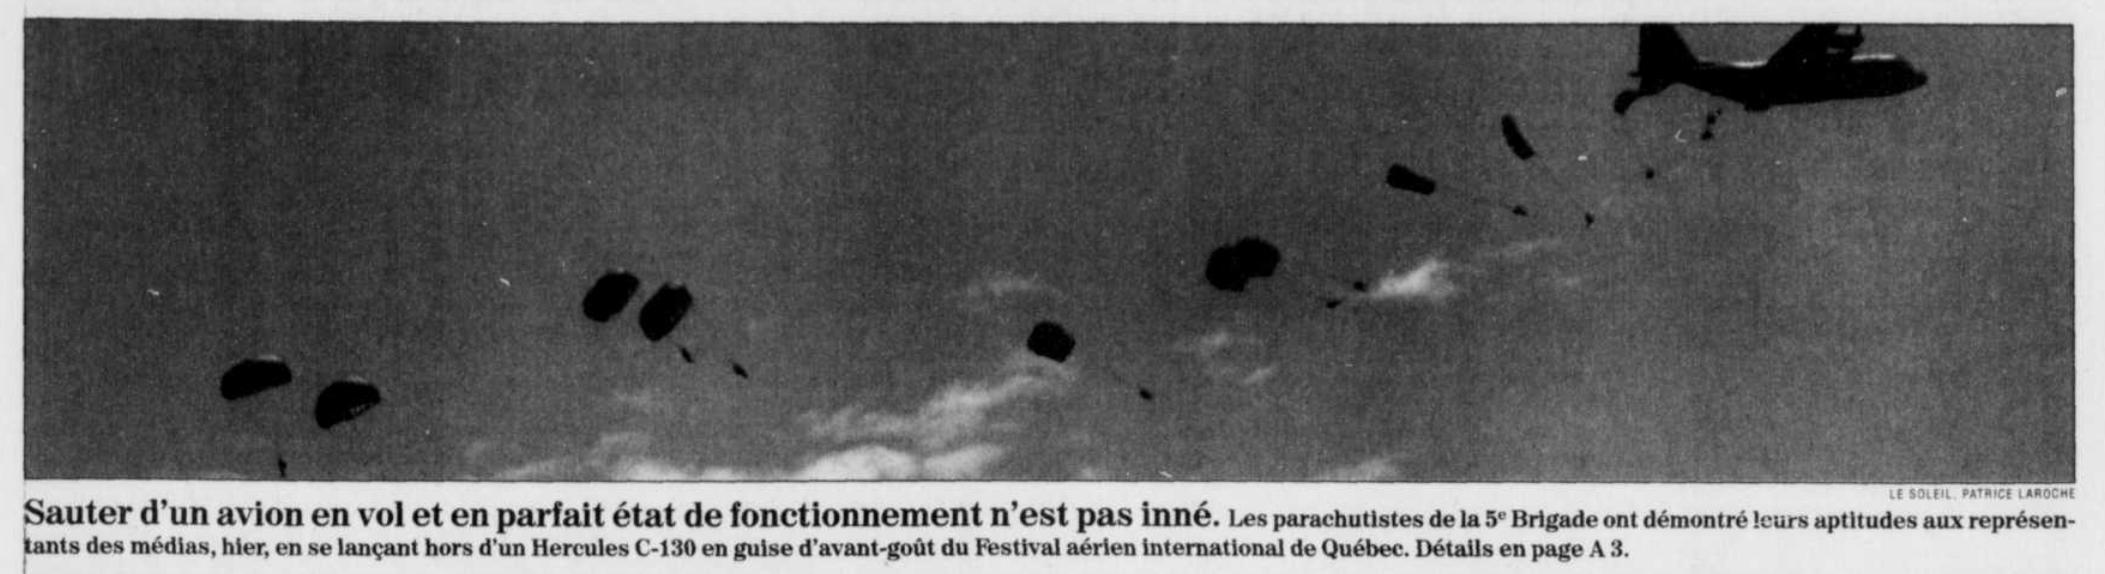 Journal Le Soleil 16 août 1997